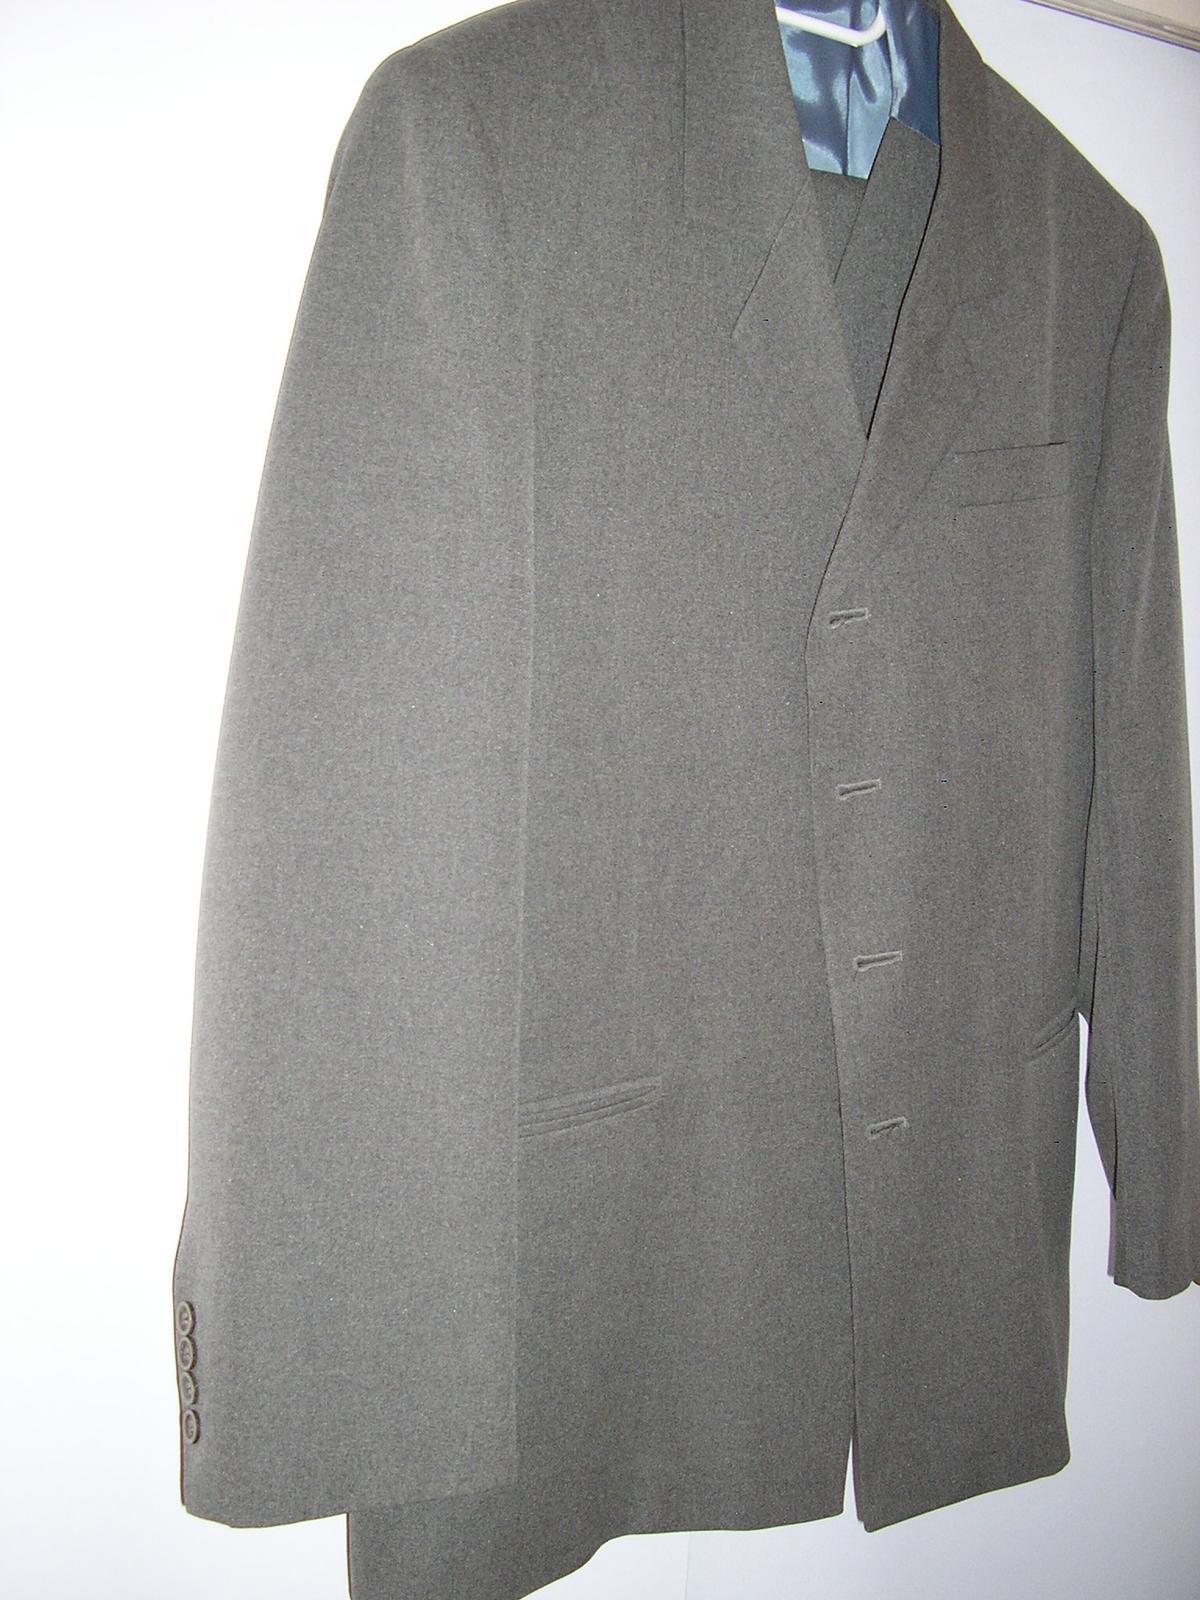 1291. Stadler Faschion sivý oblek - Obrázok č. 1